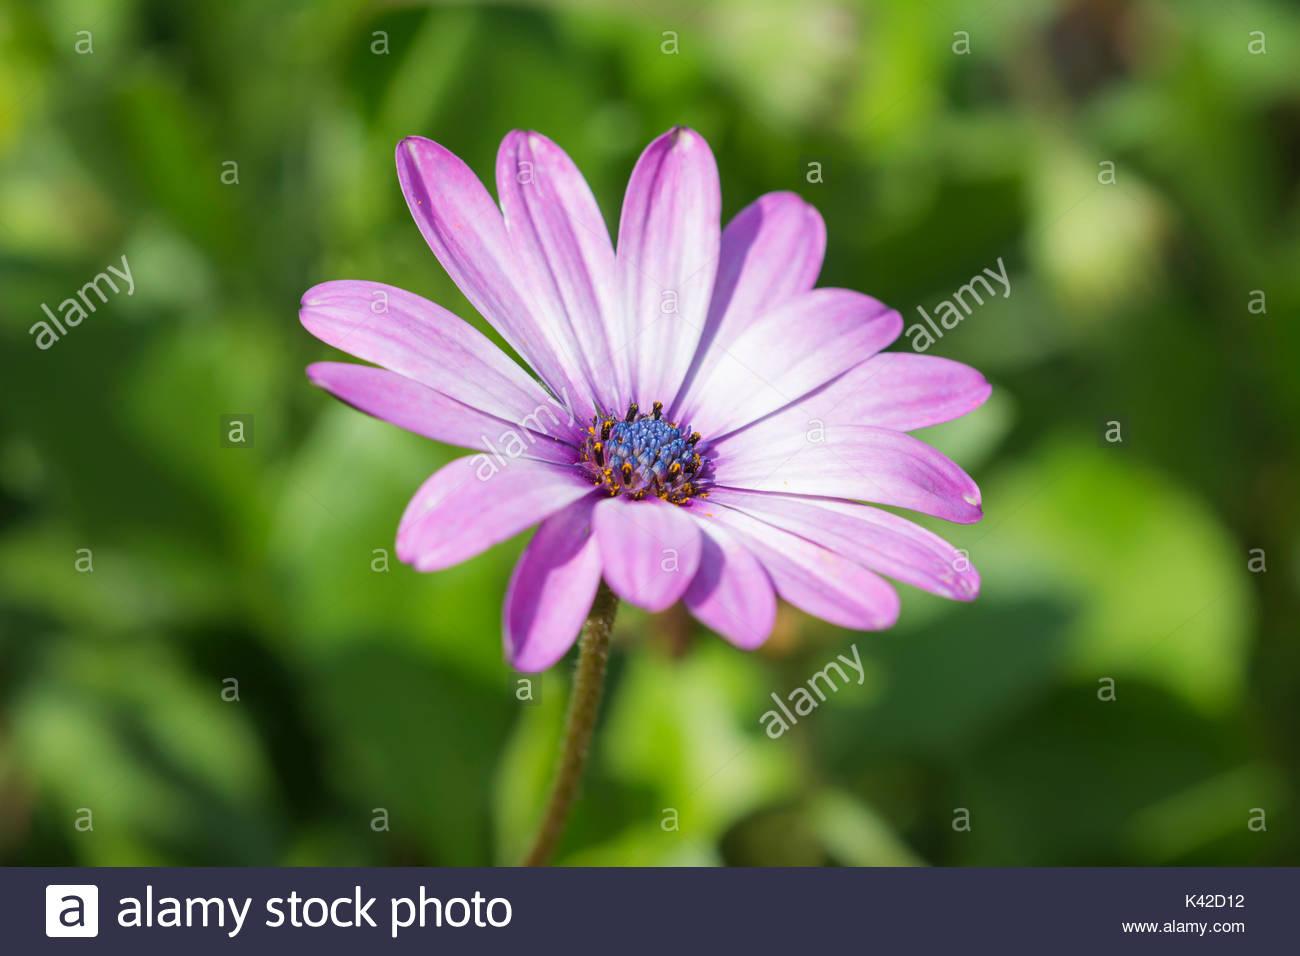 pink-osteospermum-ecklonis-african-daisy